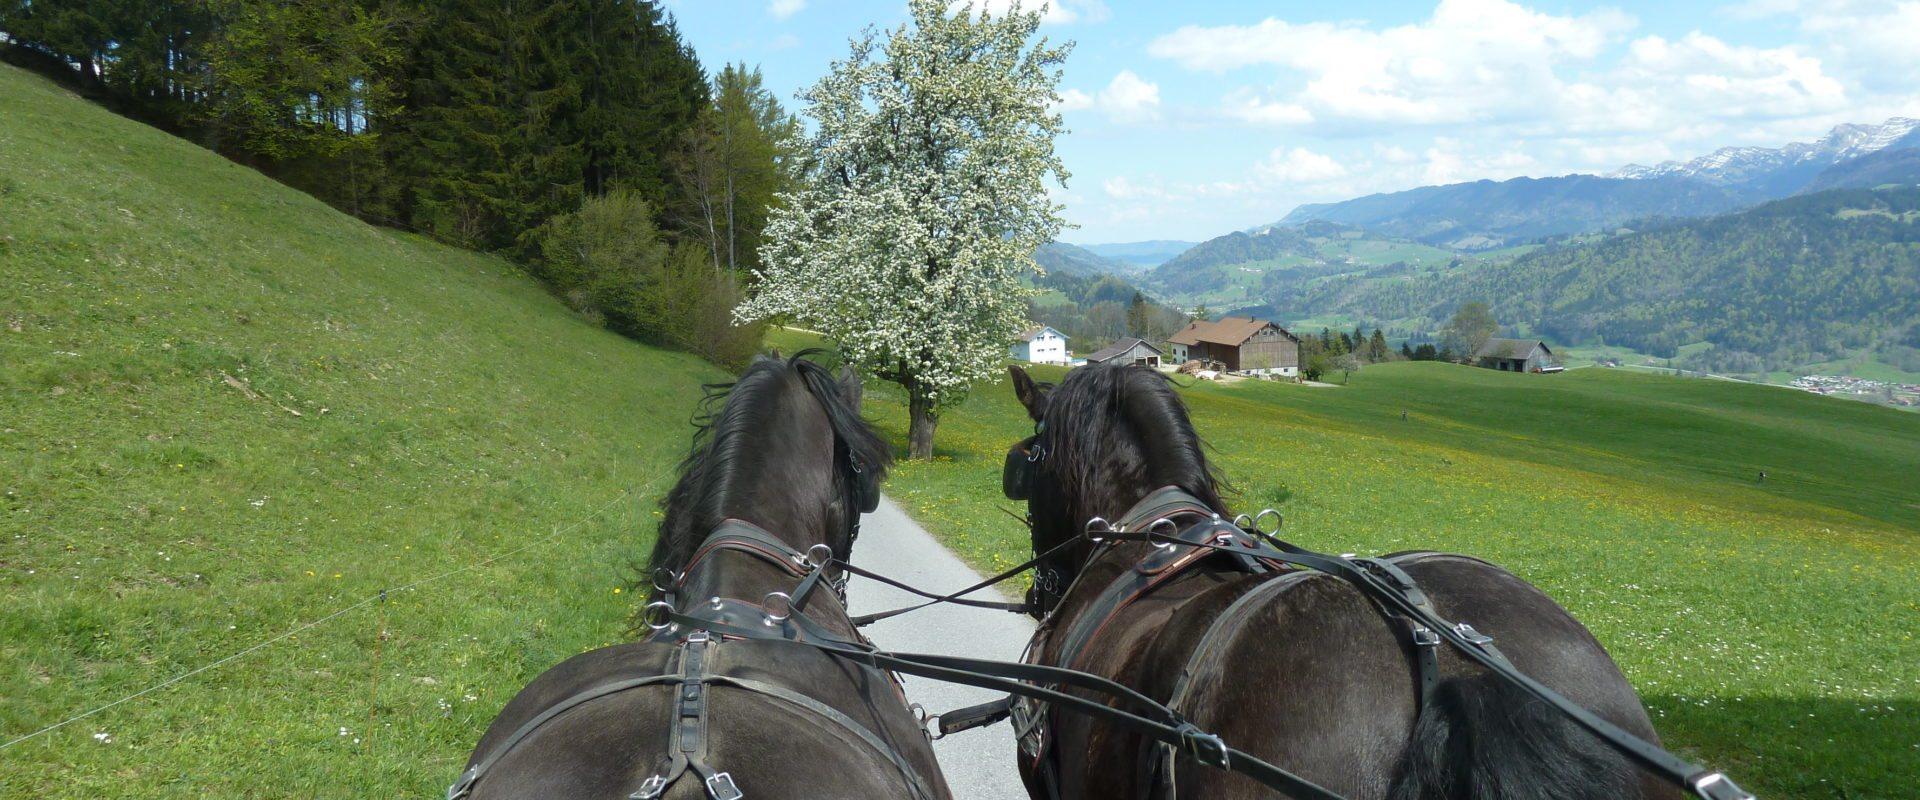 pferdekutschen_sulzberg